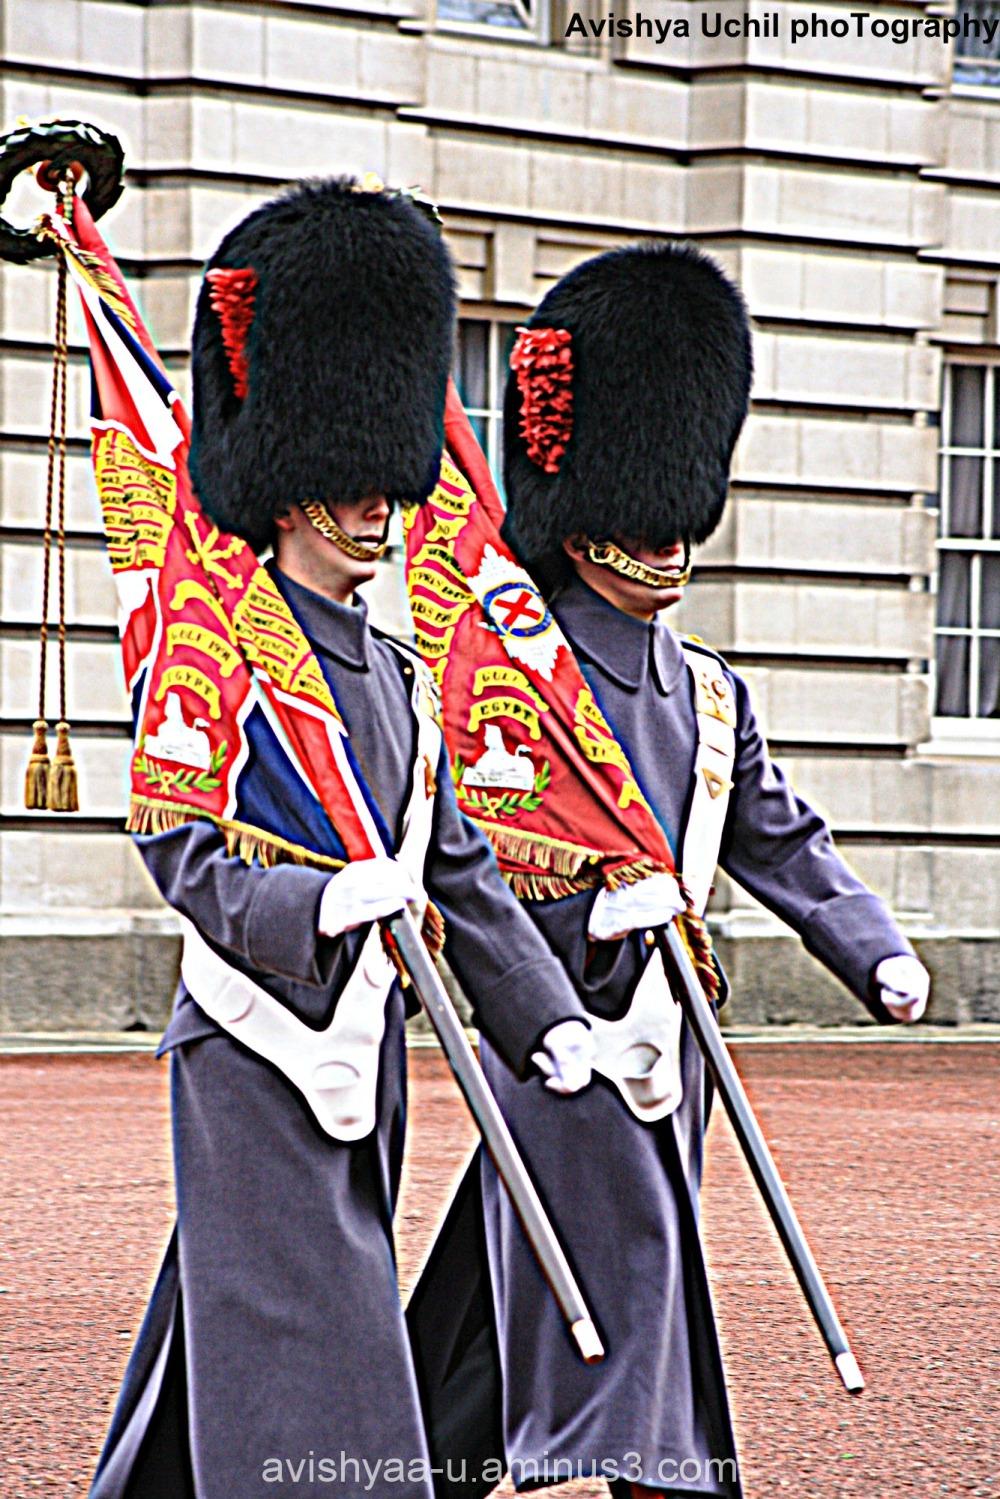 Bobbies -Change of Guard at Buckingham Palace